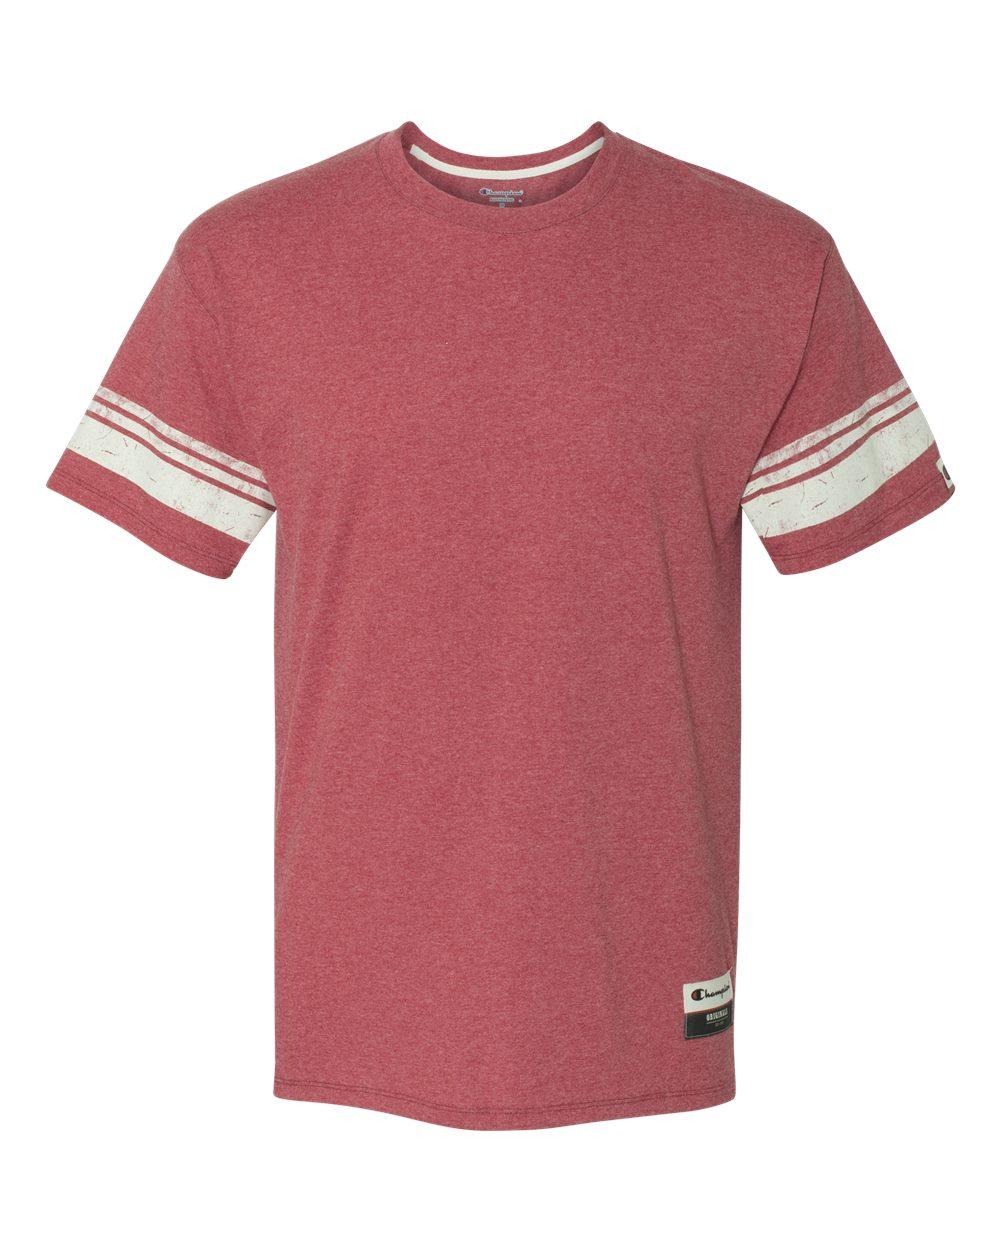 Custom Vintage T-Shirt Screen Printing Designs